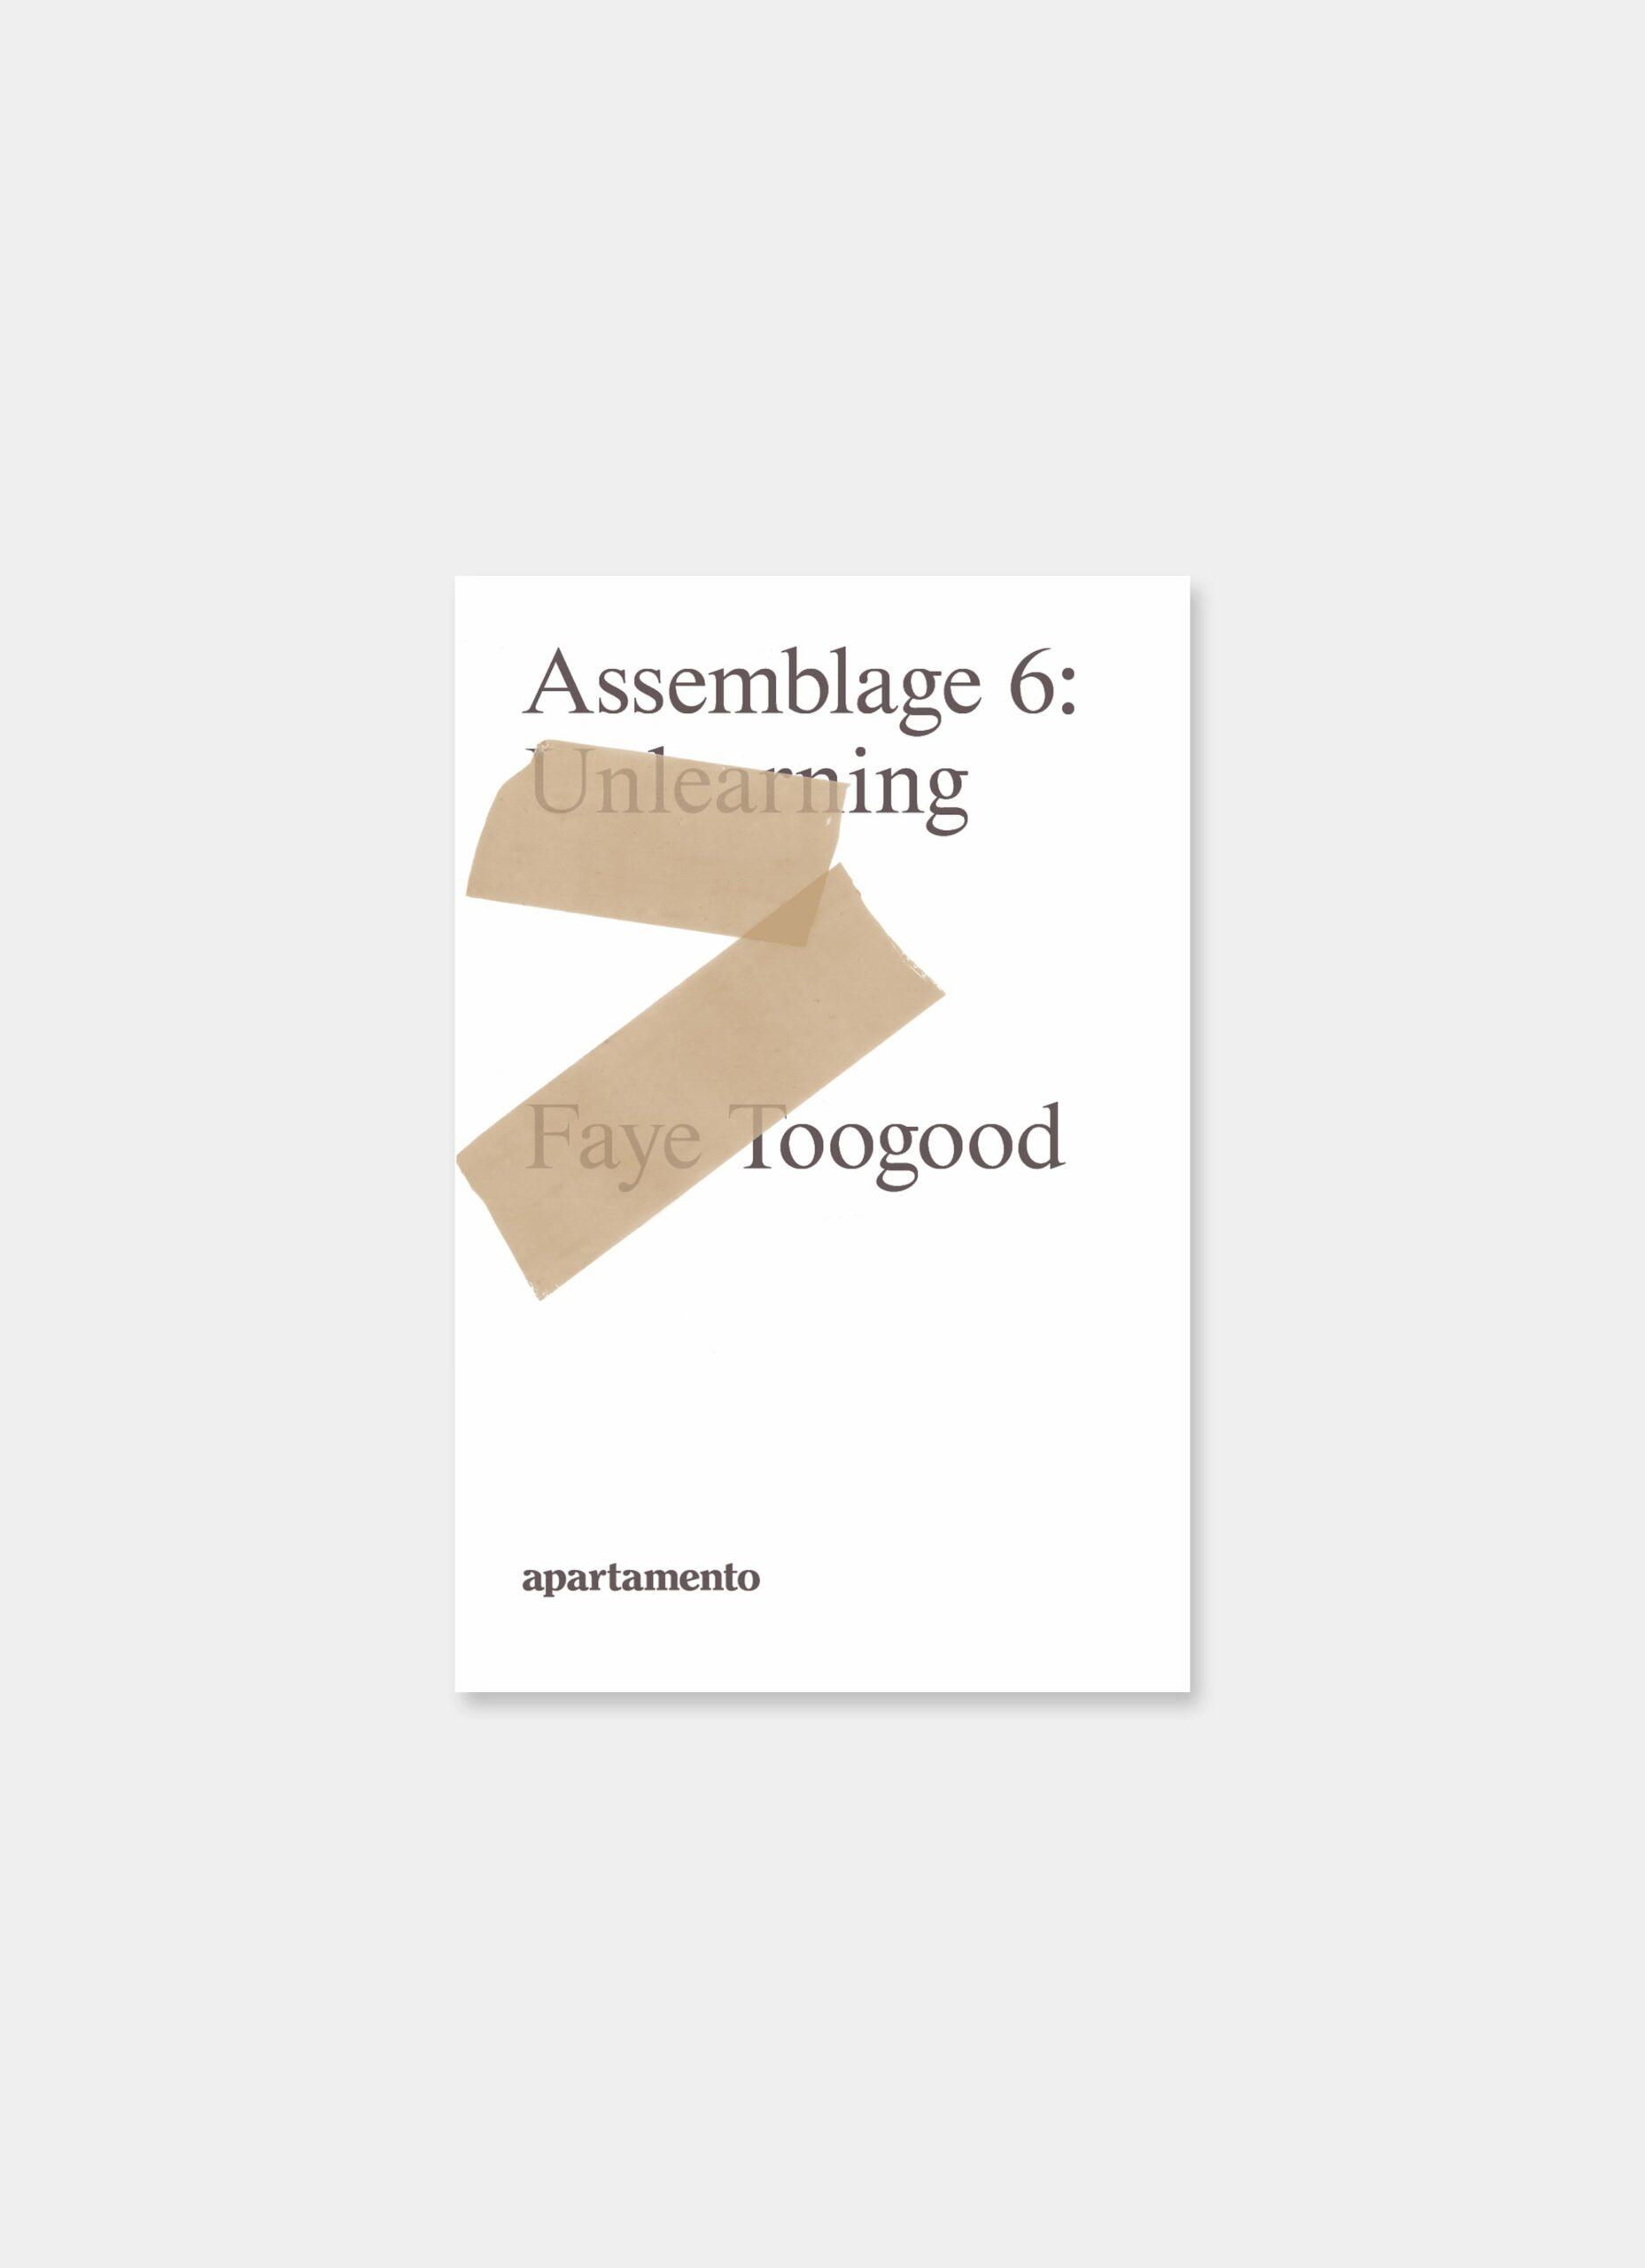 Faye Toogood - Apartamento - Assemblage 6 - Unlearning